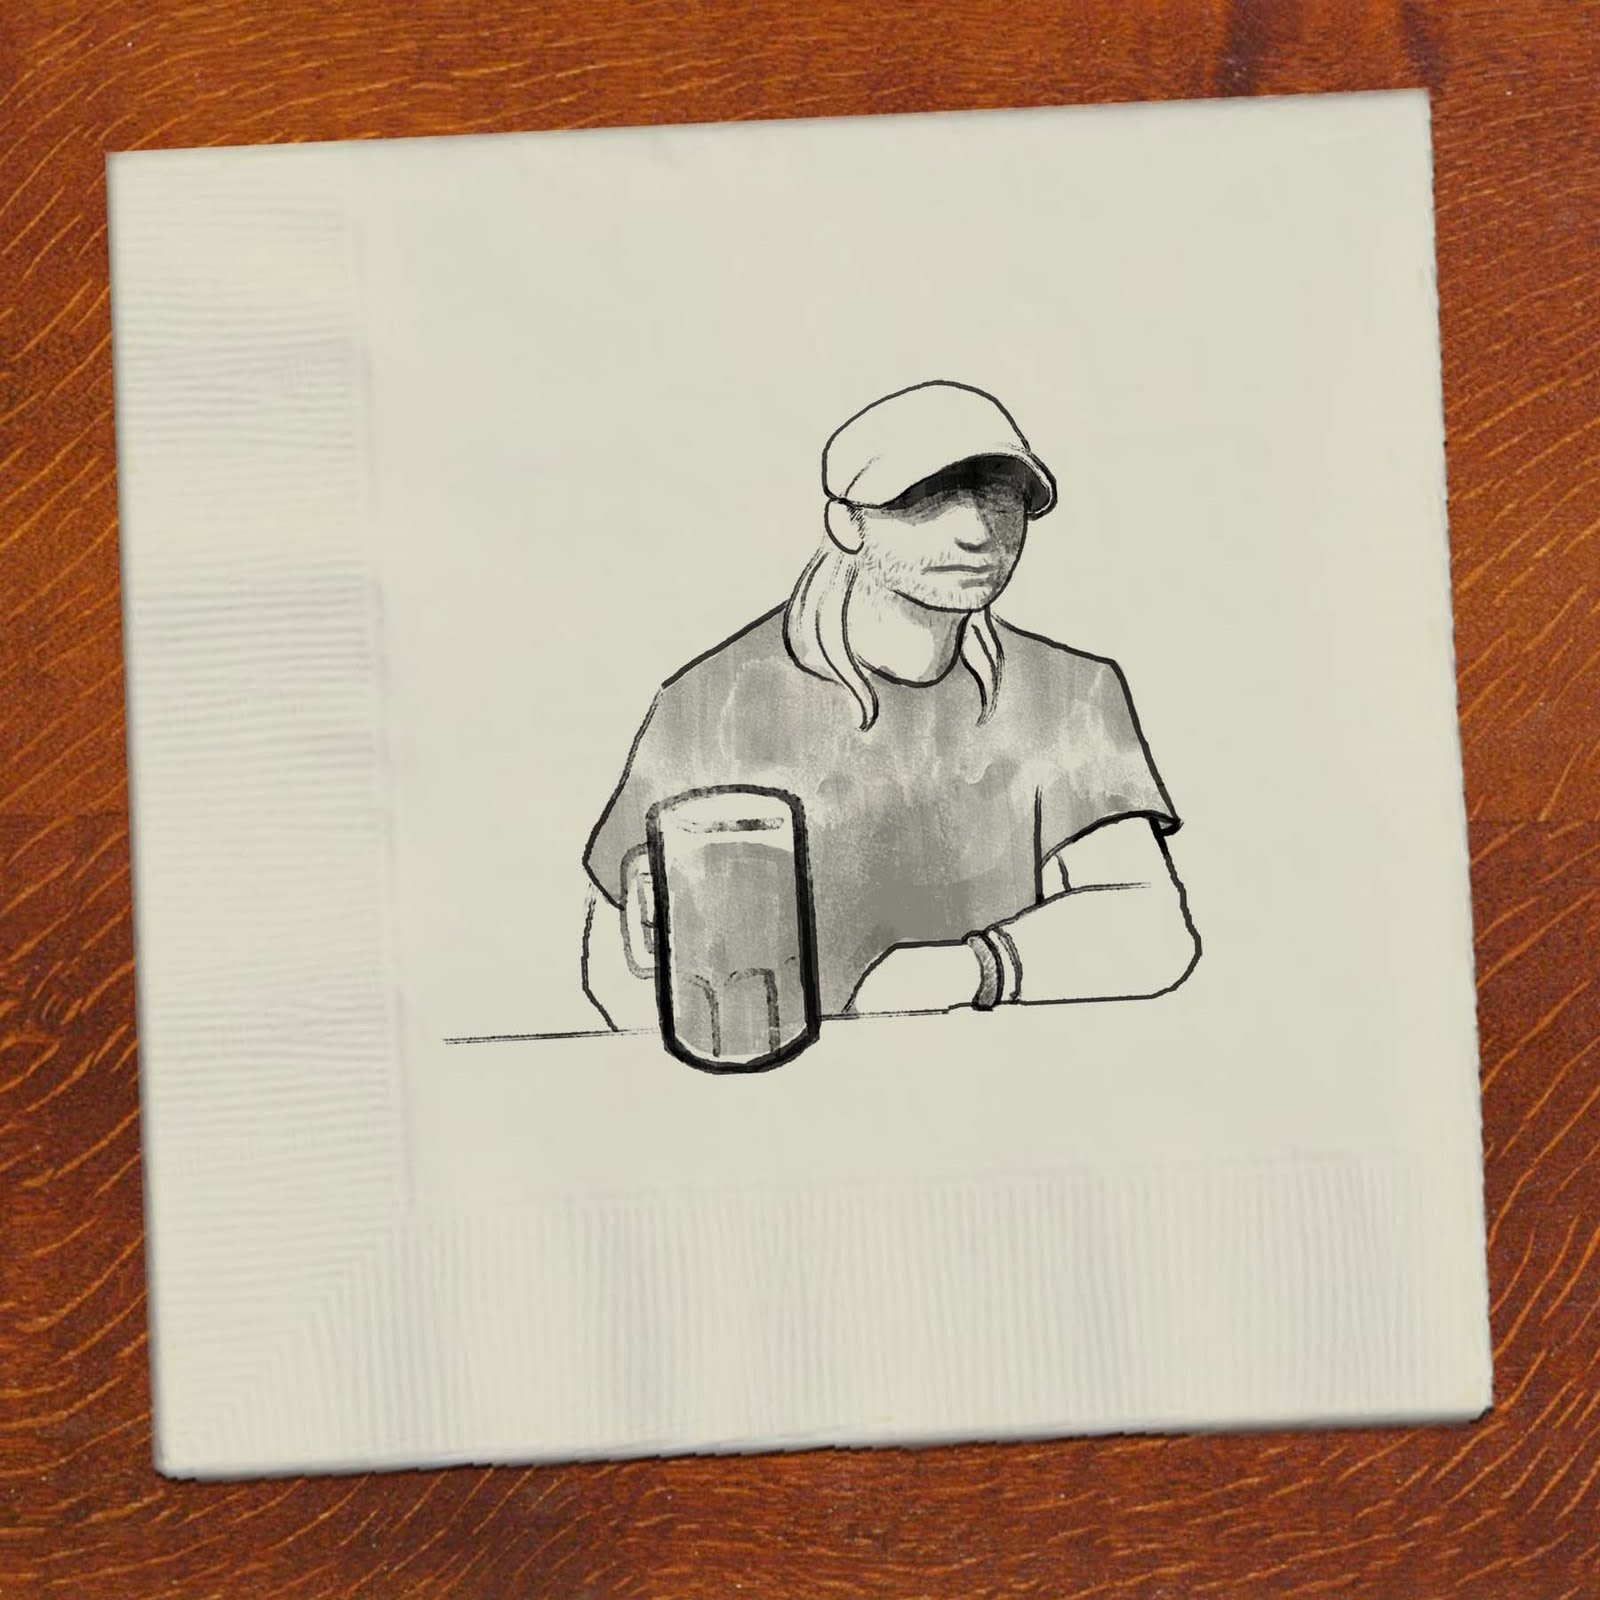 Bar napkin sketch